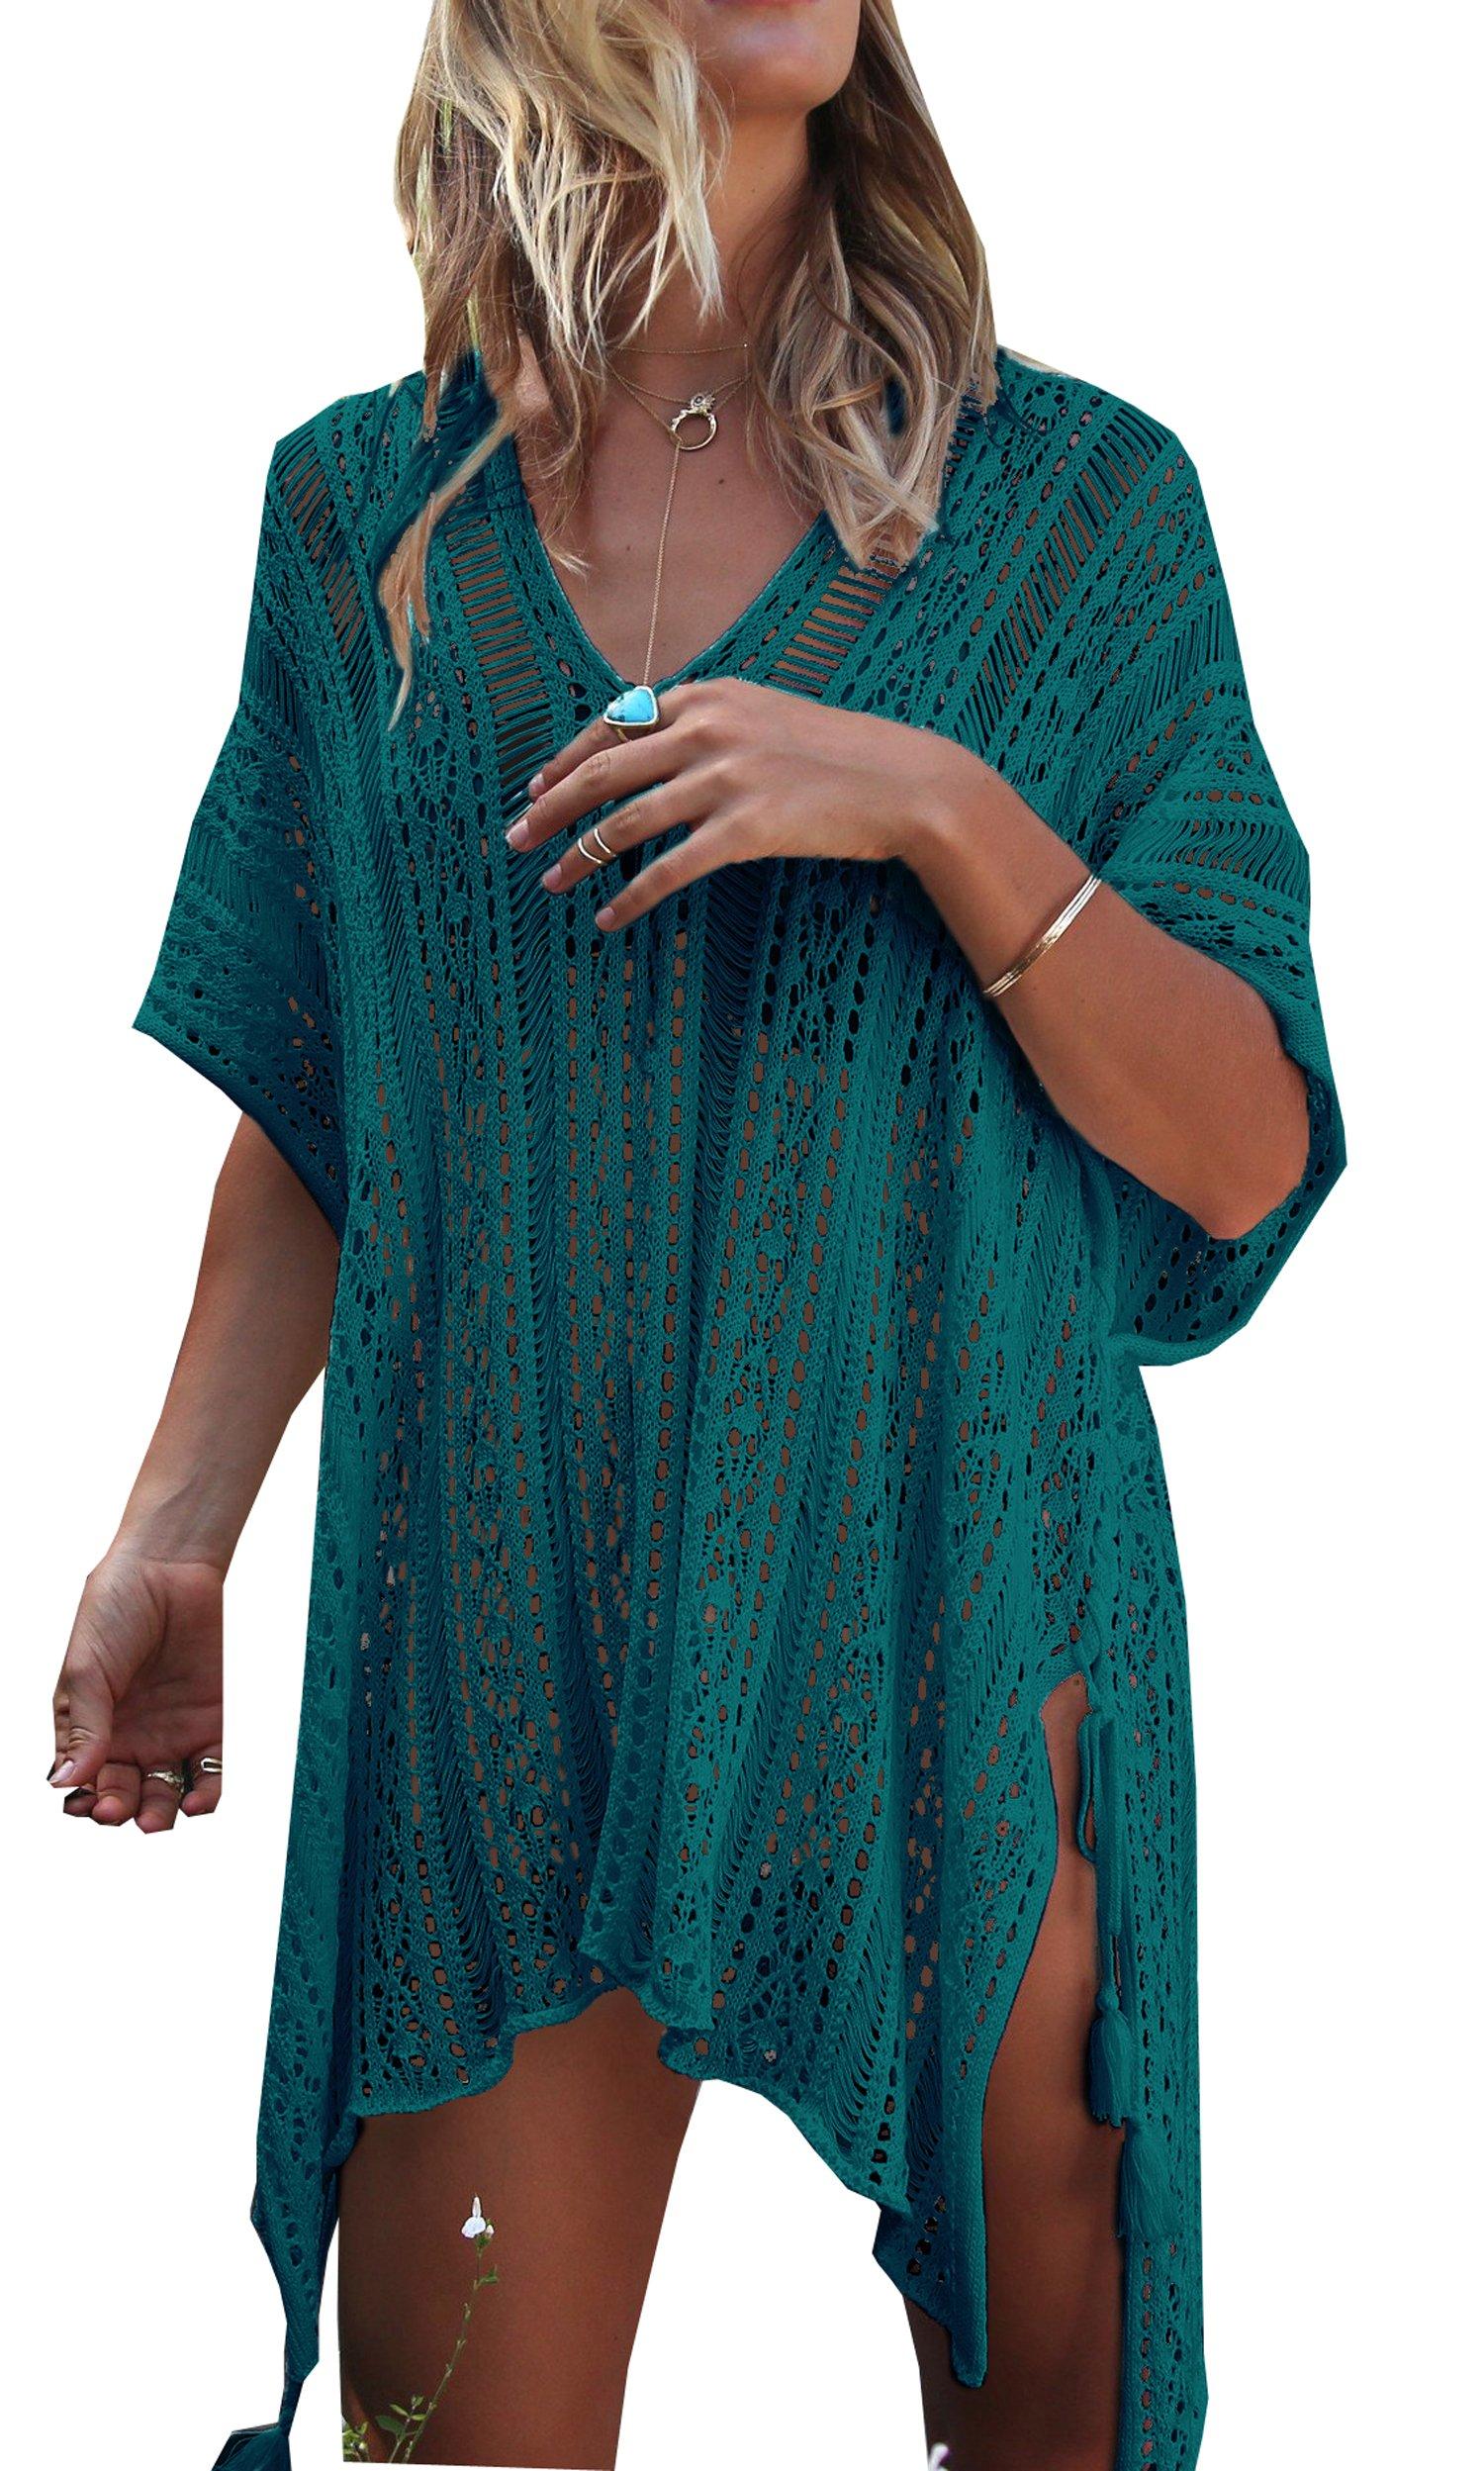 Wander Agio Beach Swimsuit For Women Sleeve Coverups Bikini Cover Up Net Slit Onesize Peacock Blue